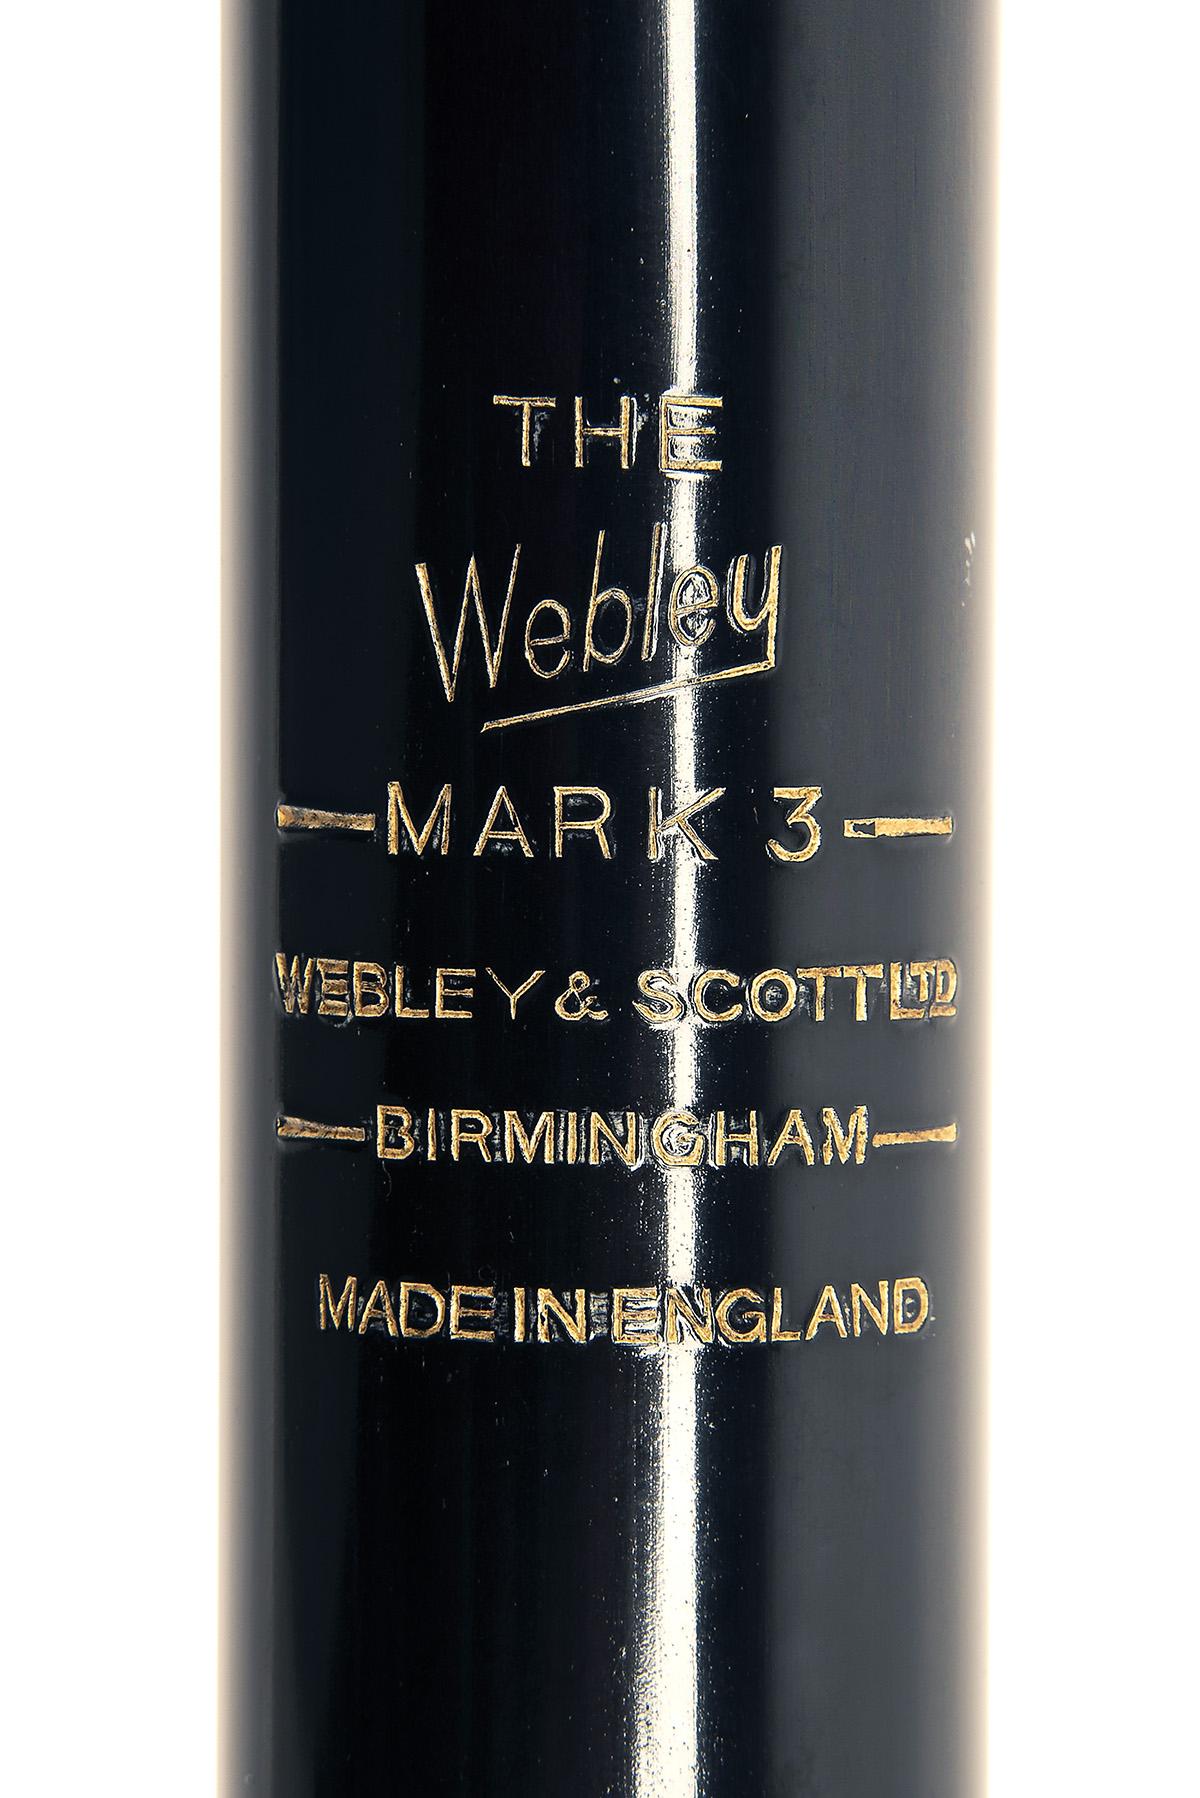 WEBLEY & SCOTT, BIRMINGHAM A SCARCE BOXED .22 UNDER-LEVER AIR-RIFLE, MODEL 'MK3 TRANSITIONAL', - Image 3 of 4